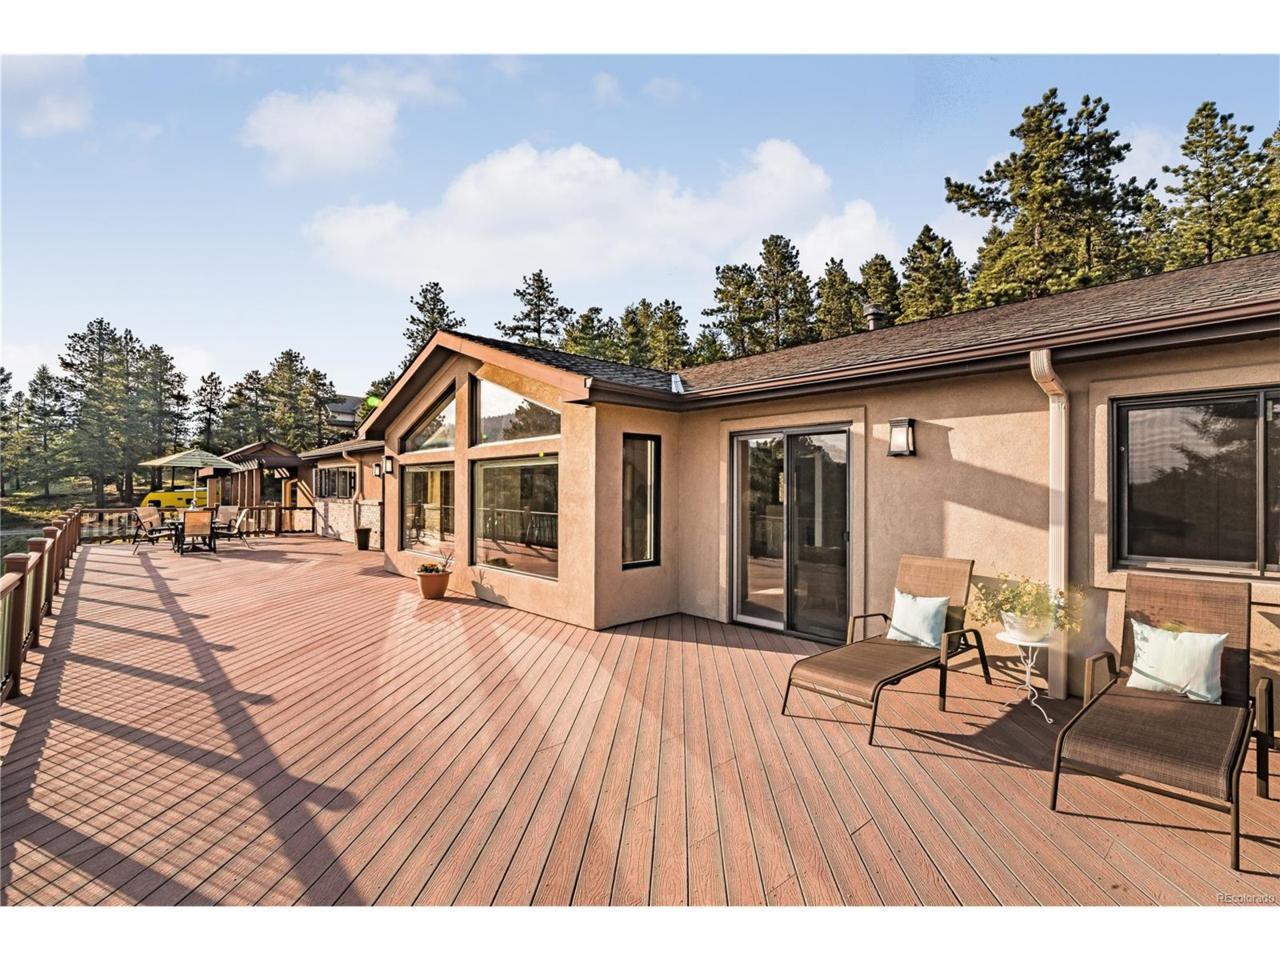 11332 Belle Meade Drive, Conifer, CO 80433 (MLS #7408489) :: 8z Real Estate